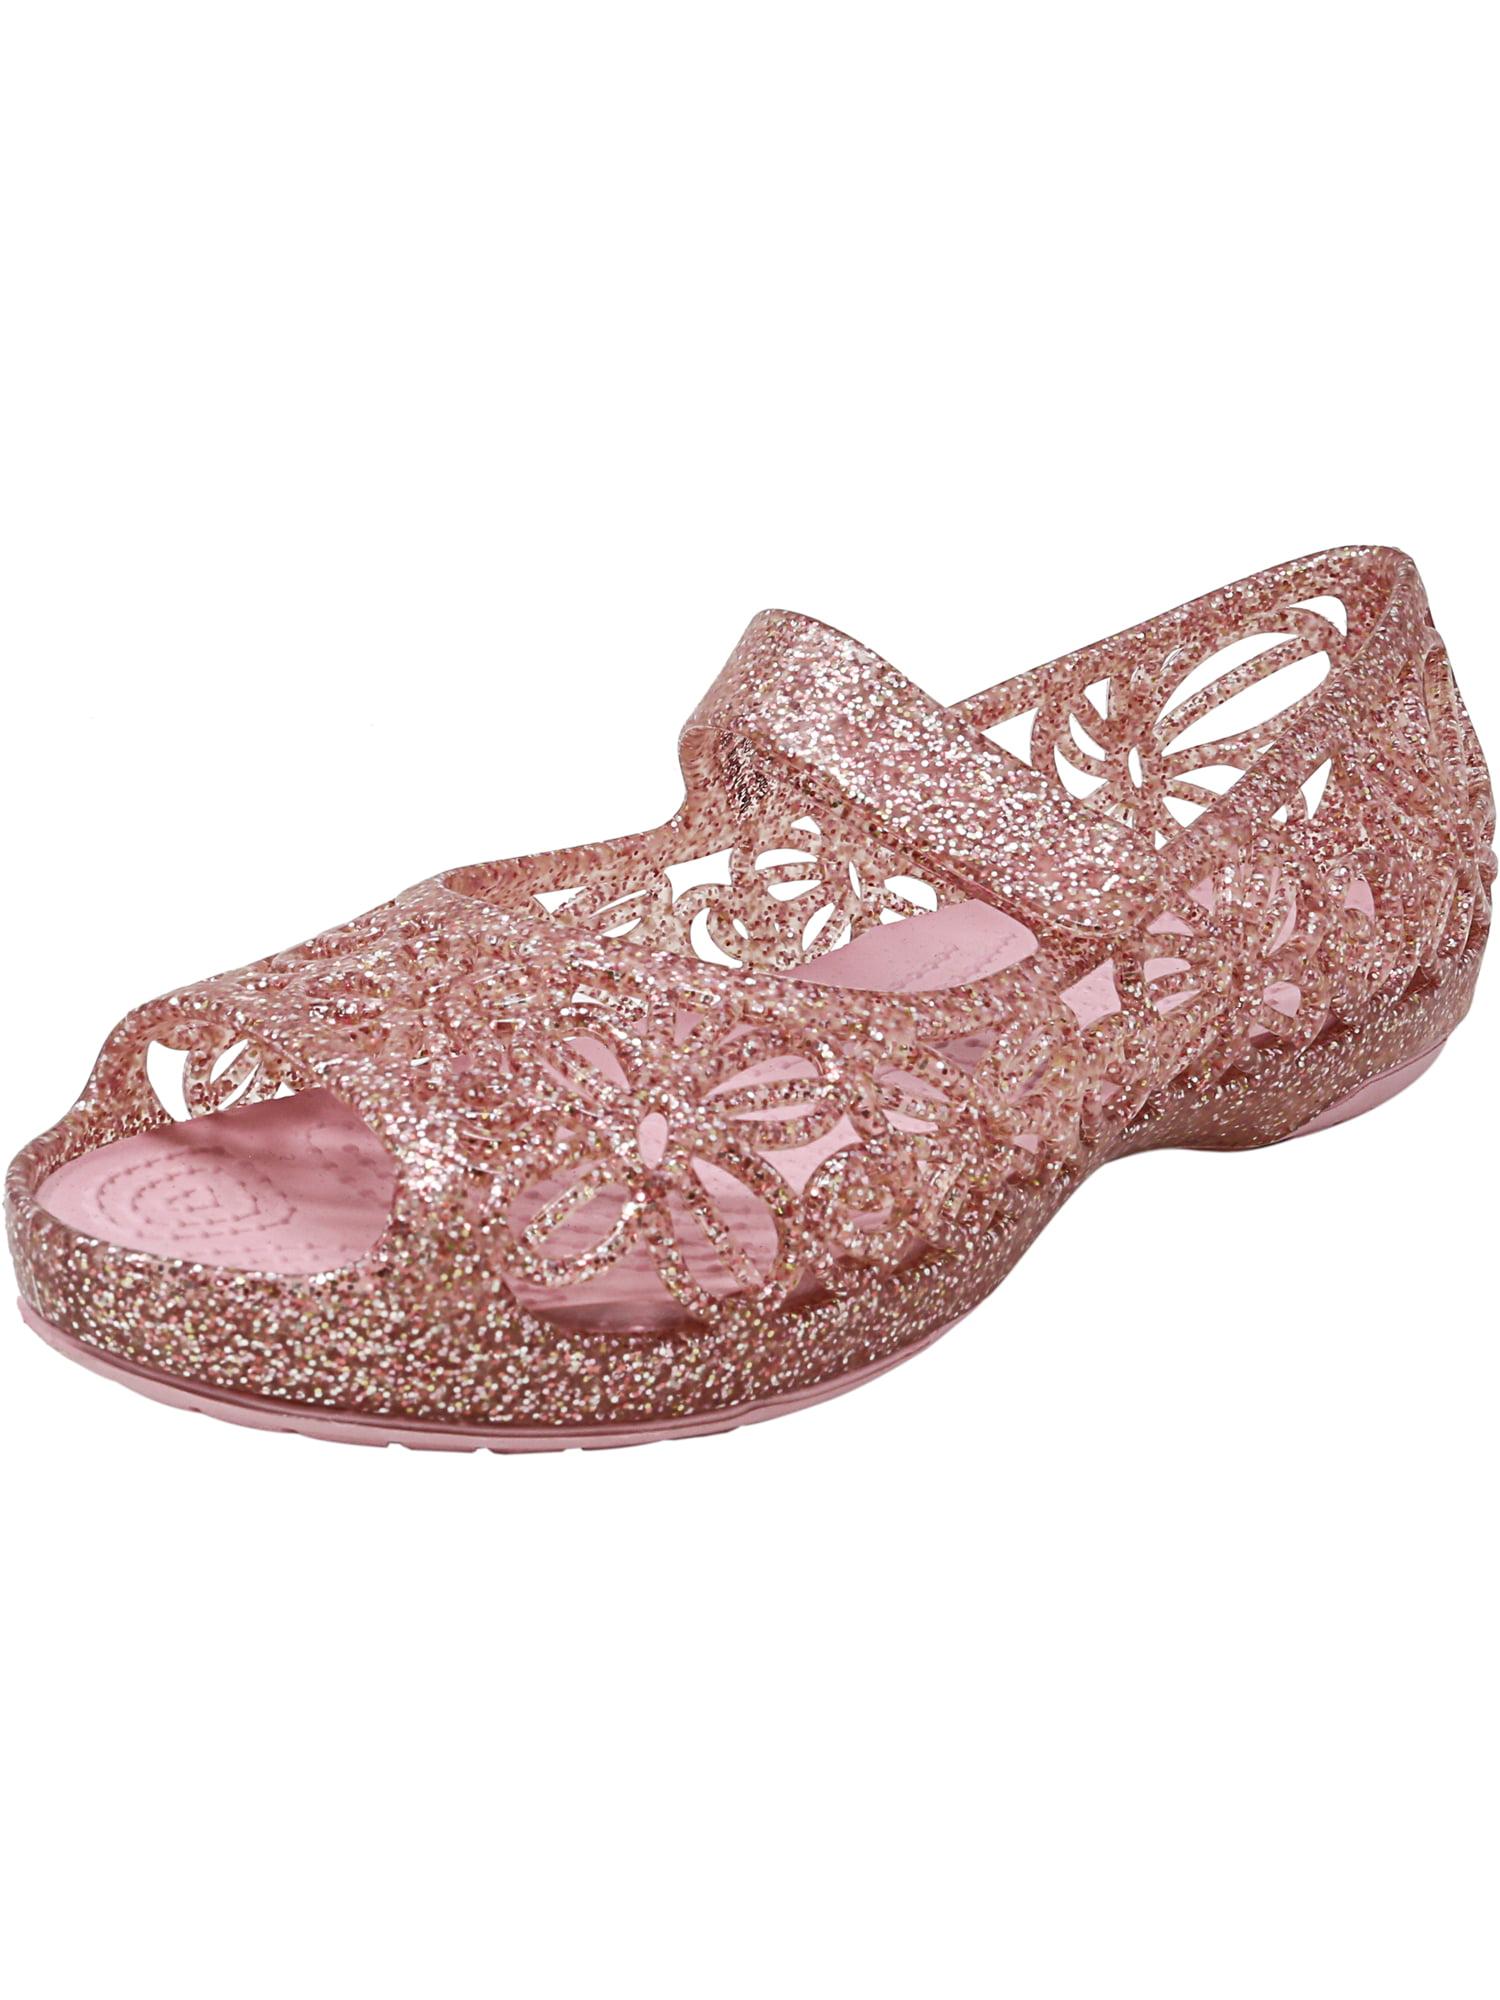 7b67cd1fa81a Crocs Isabella Glitter Flat Fuchsia   Candy Pink Ankle-High Shoe - 7M